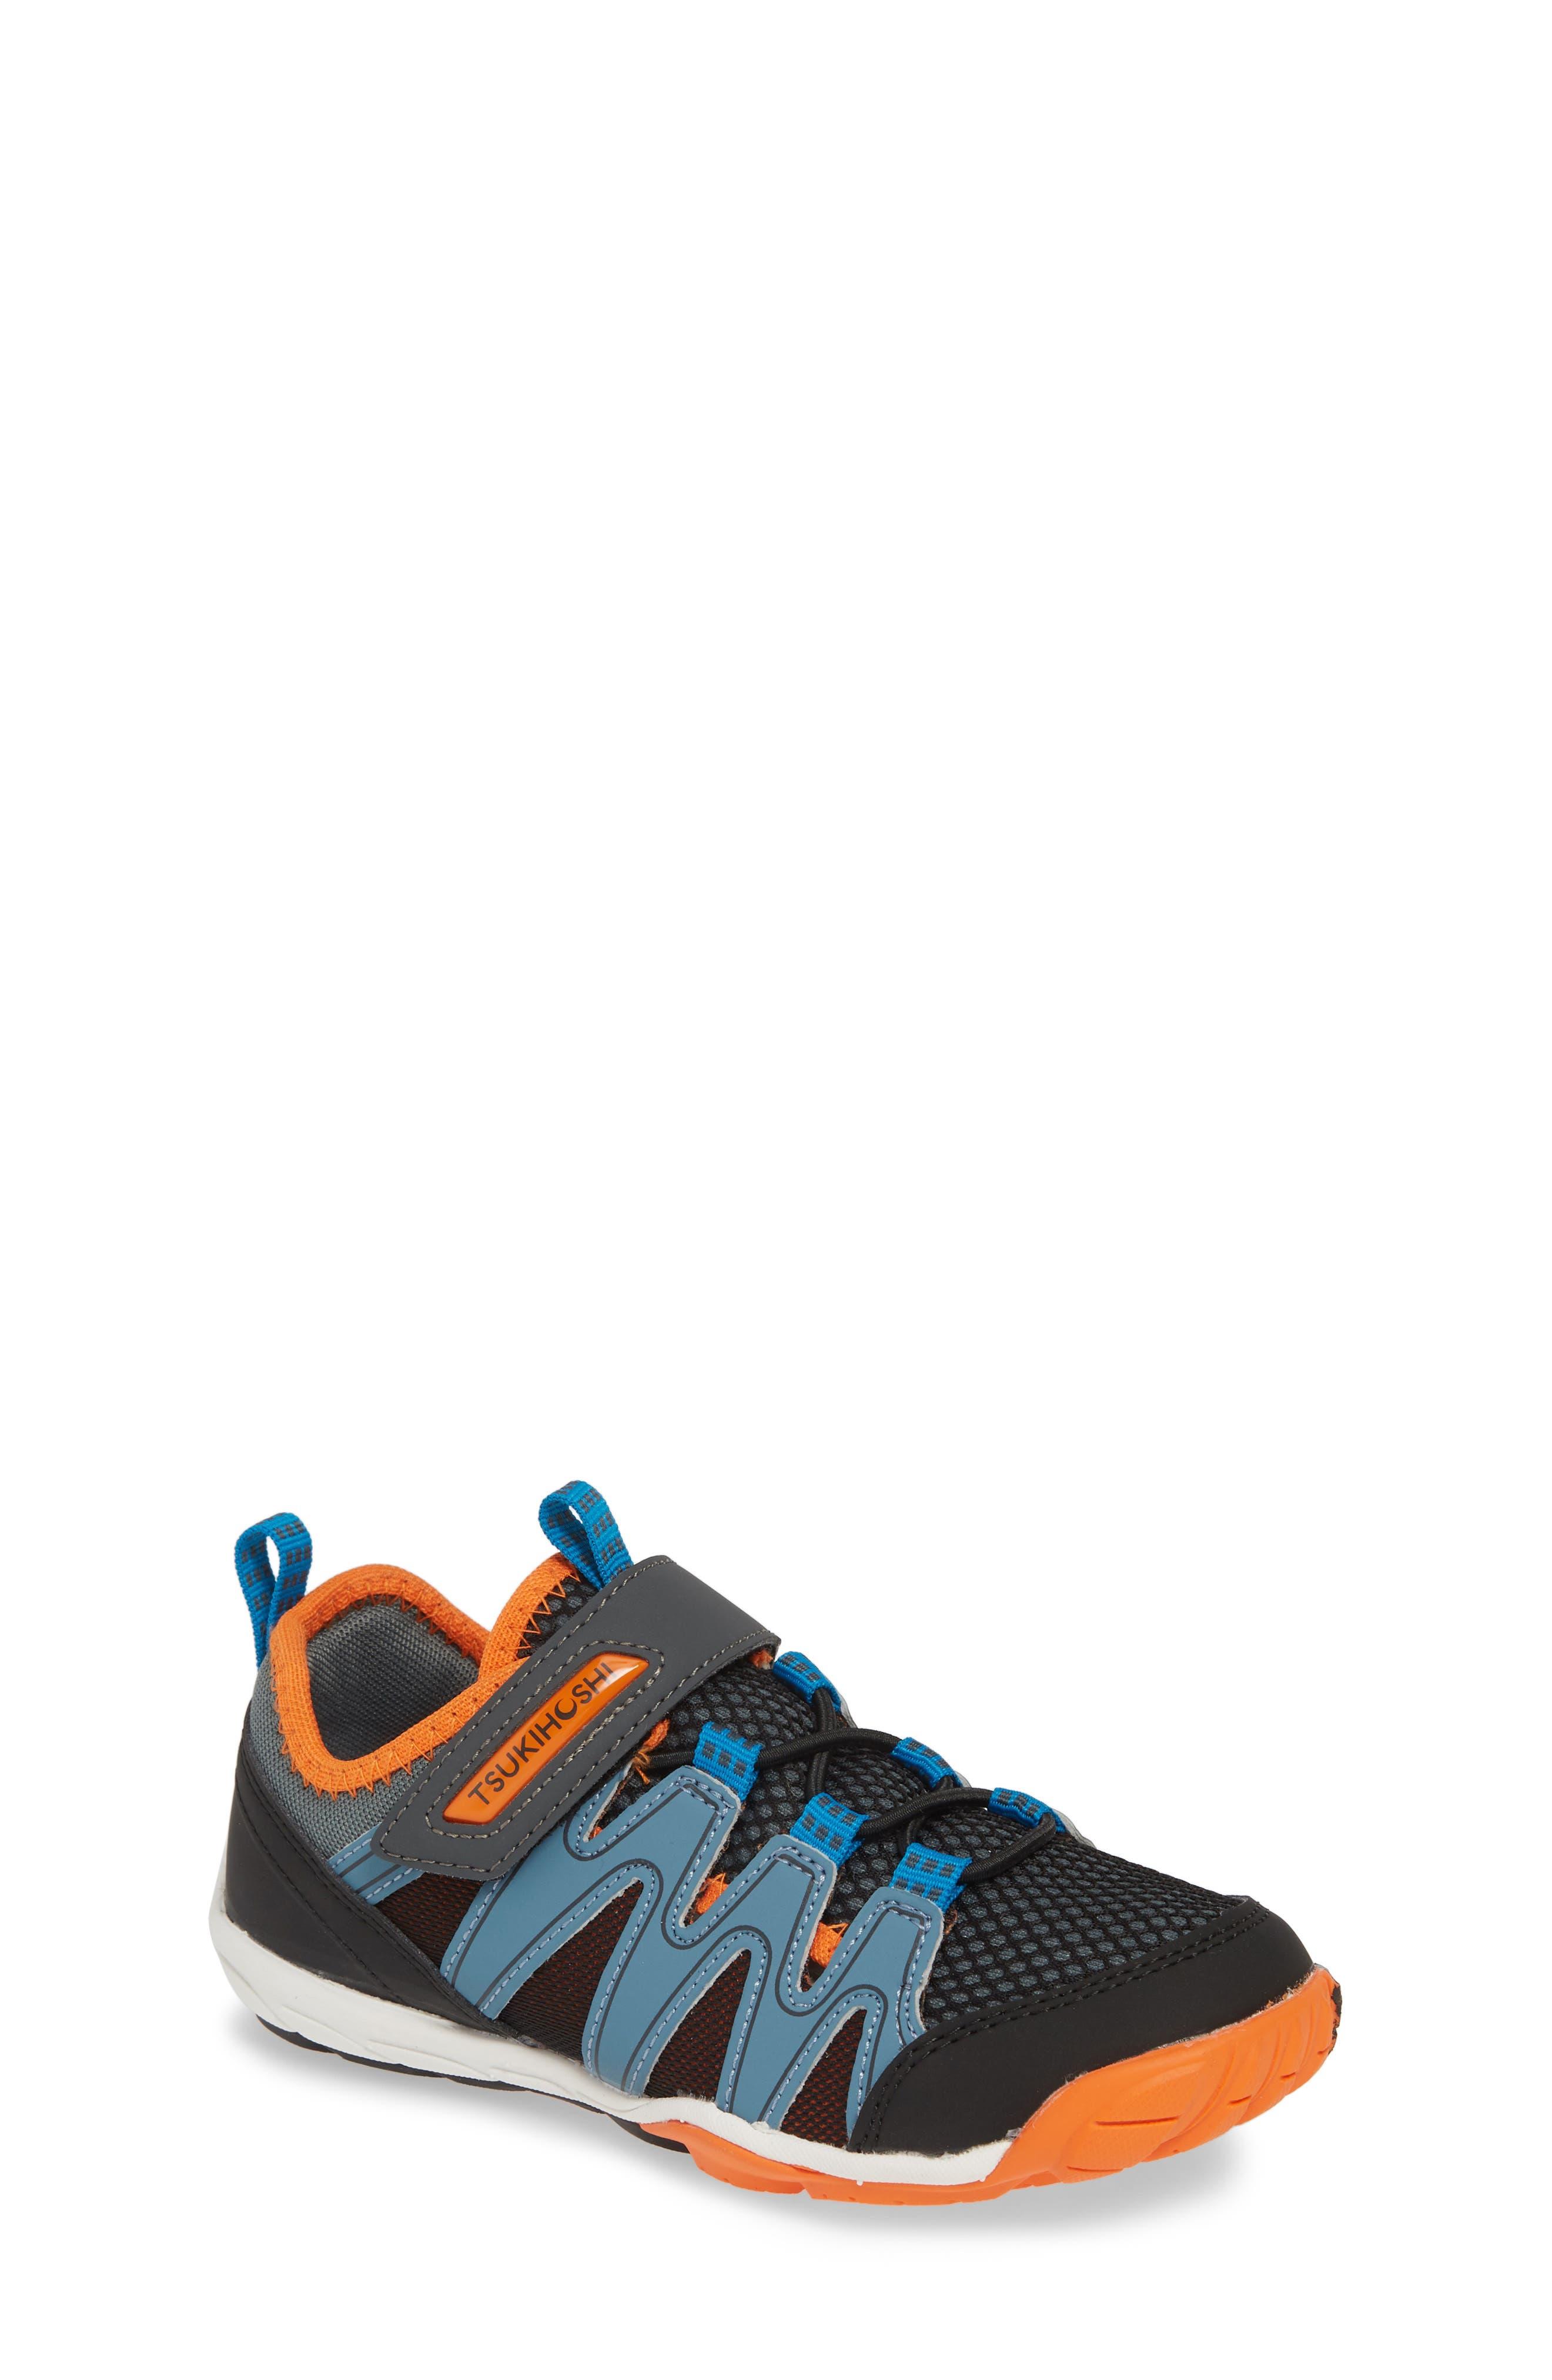 TSUKIHOSHI Wave Washable Sneaker, Main, color, BLACK/ ORANGE